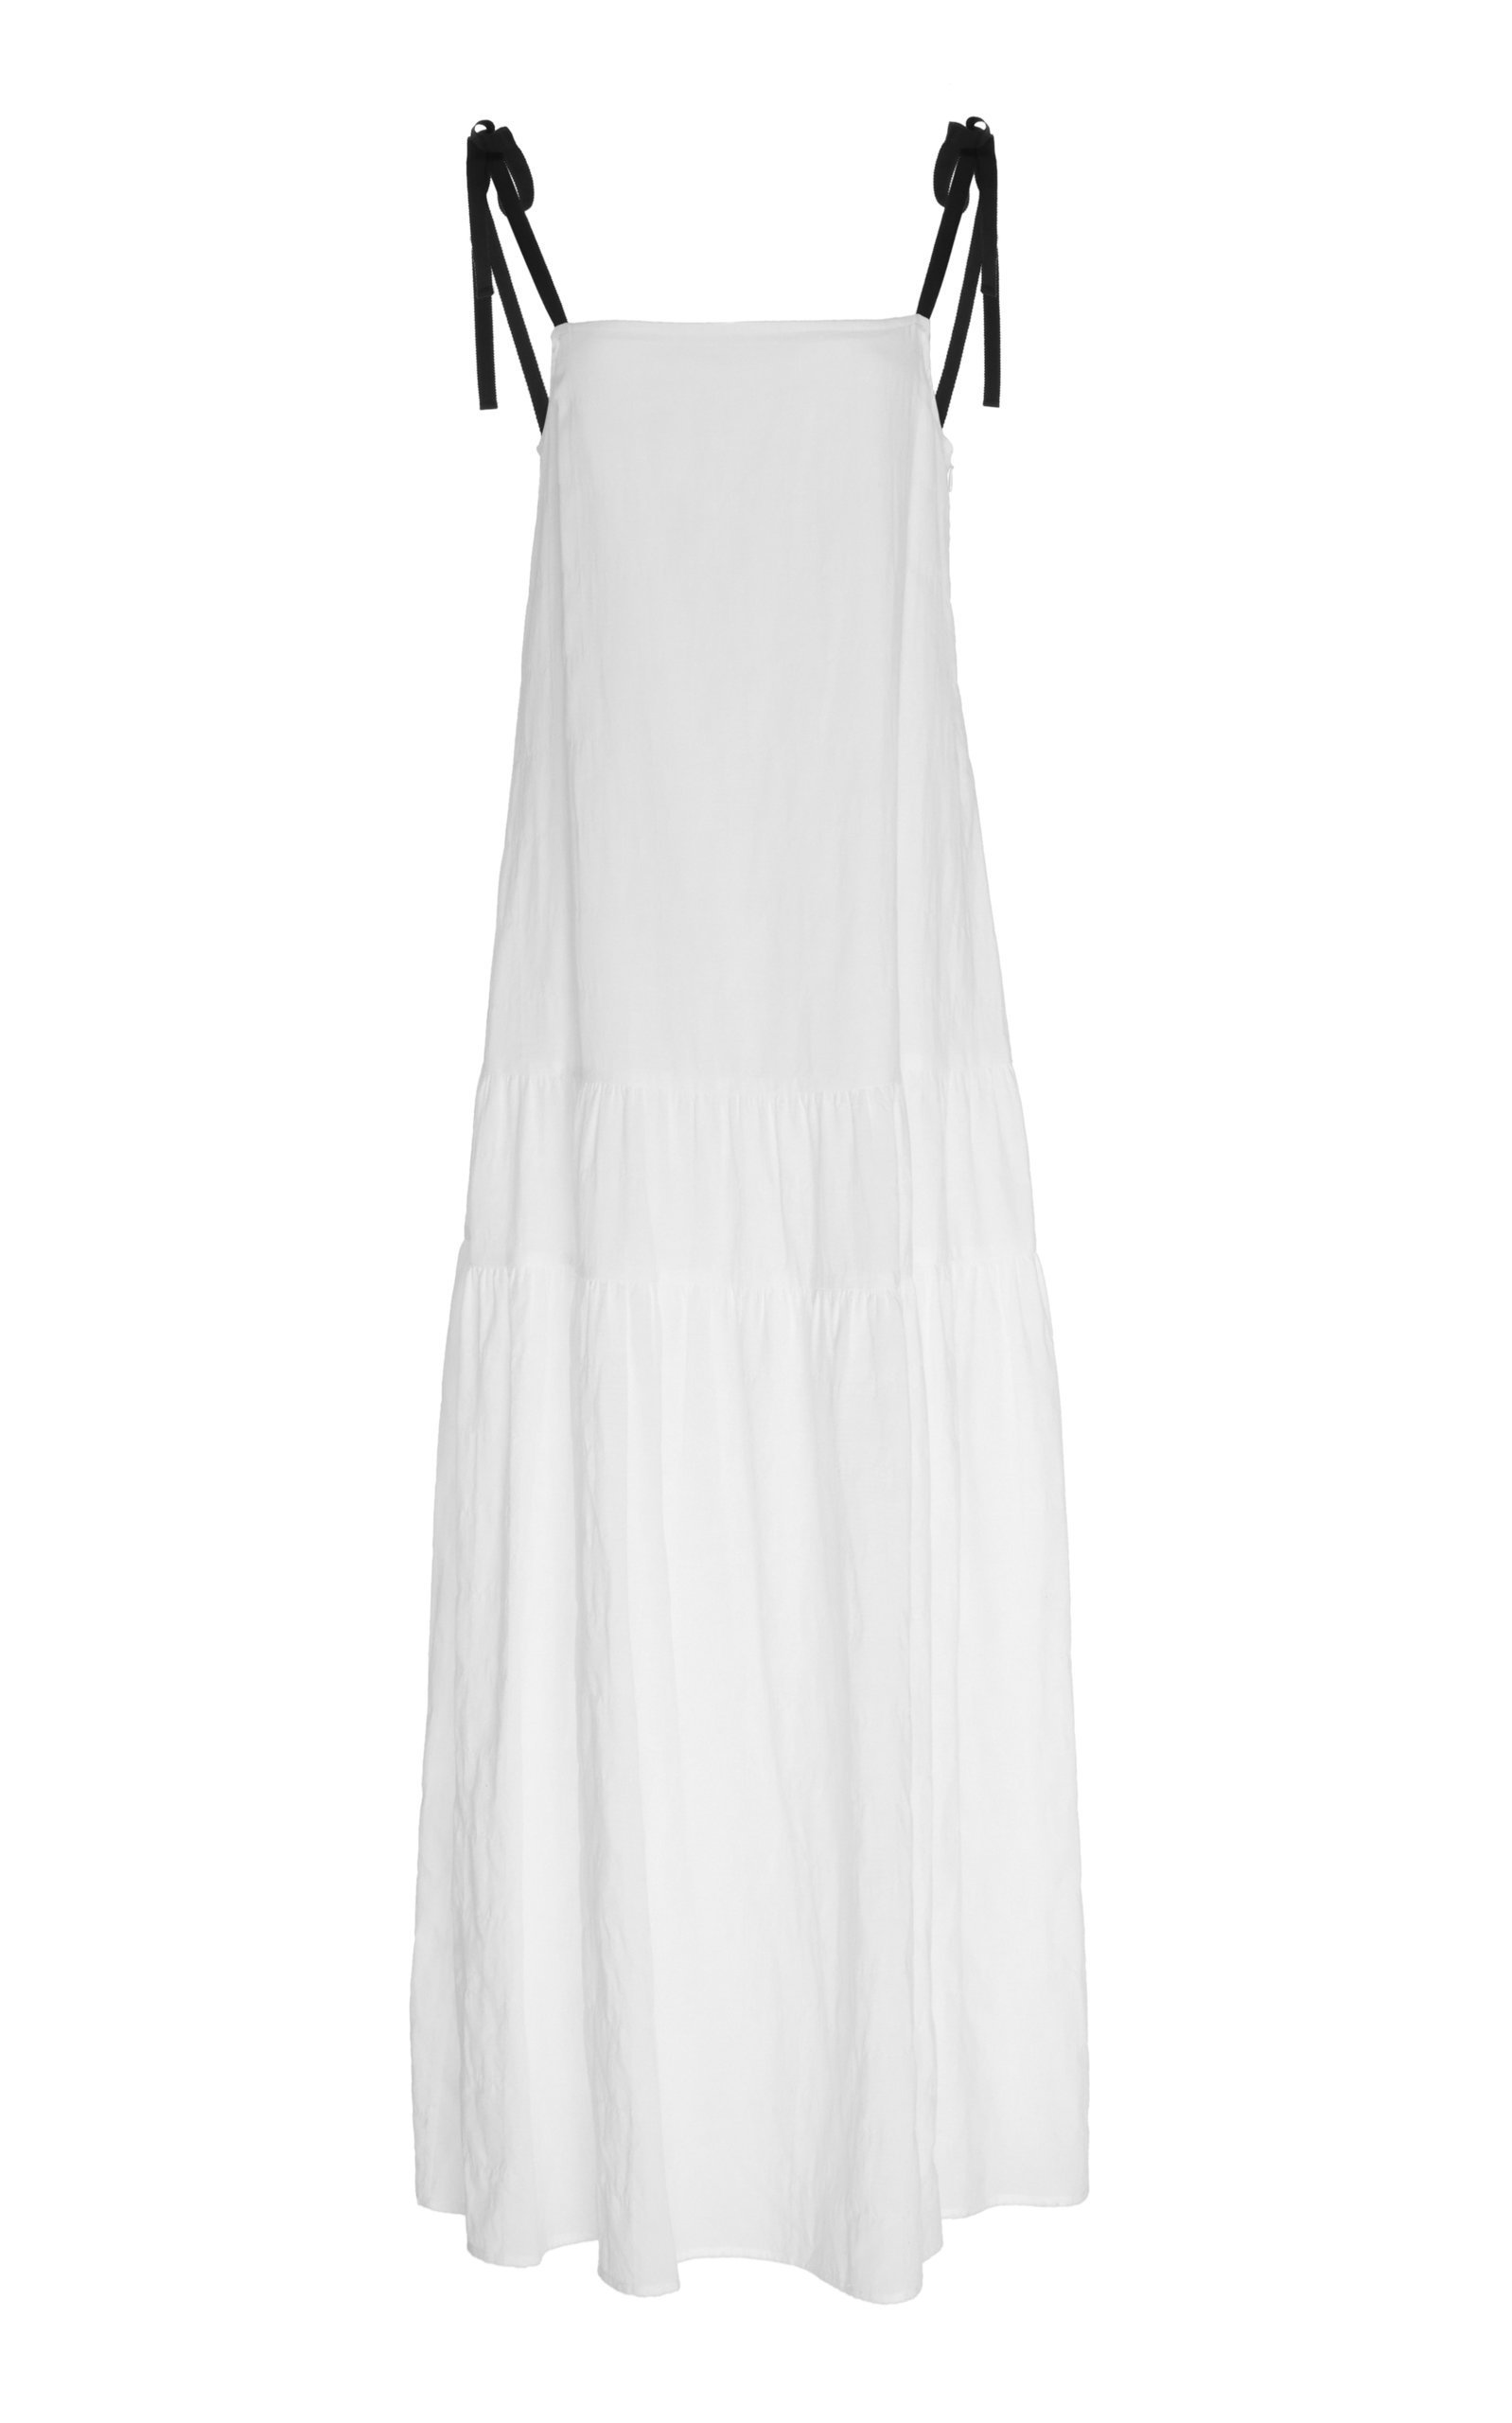 Merlette Deia Tie Strap Maxi Dress Maxi Dress Fashion Fashion Collection [ 2560 x 1598 Pixel ]